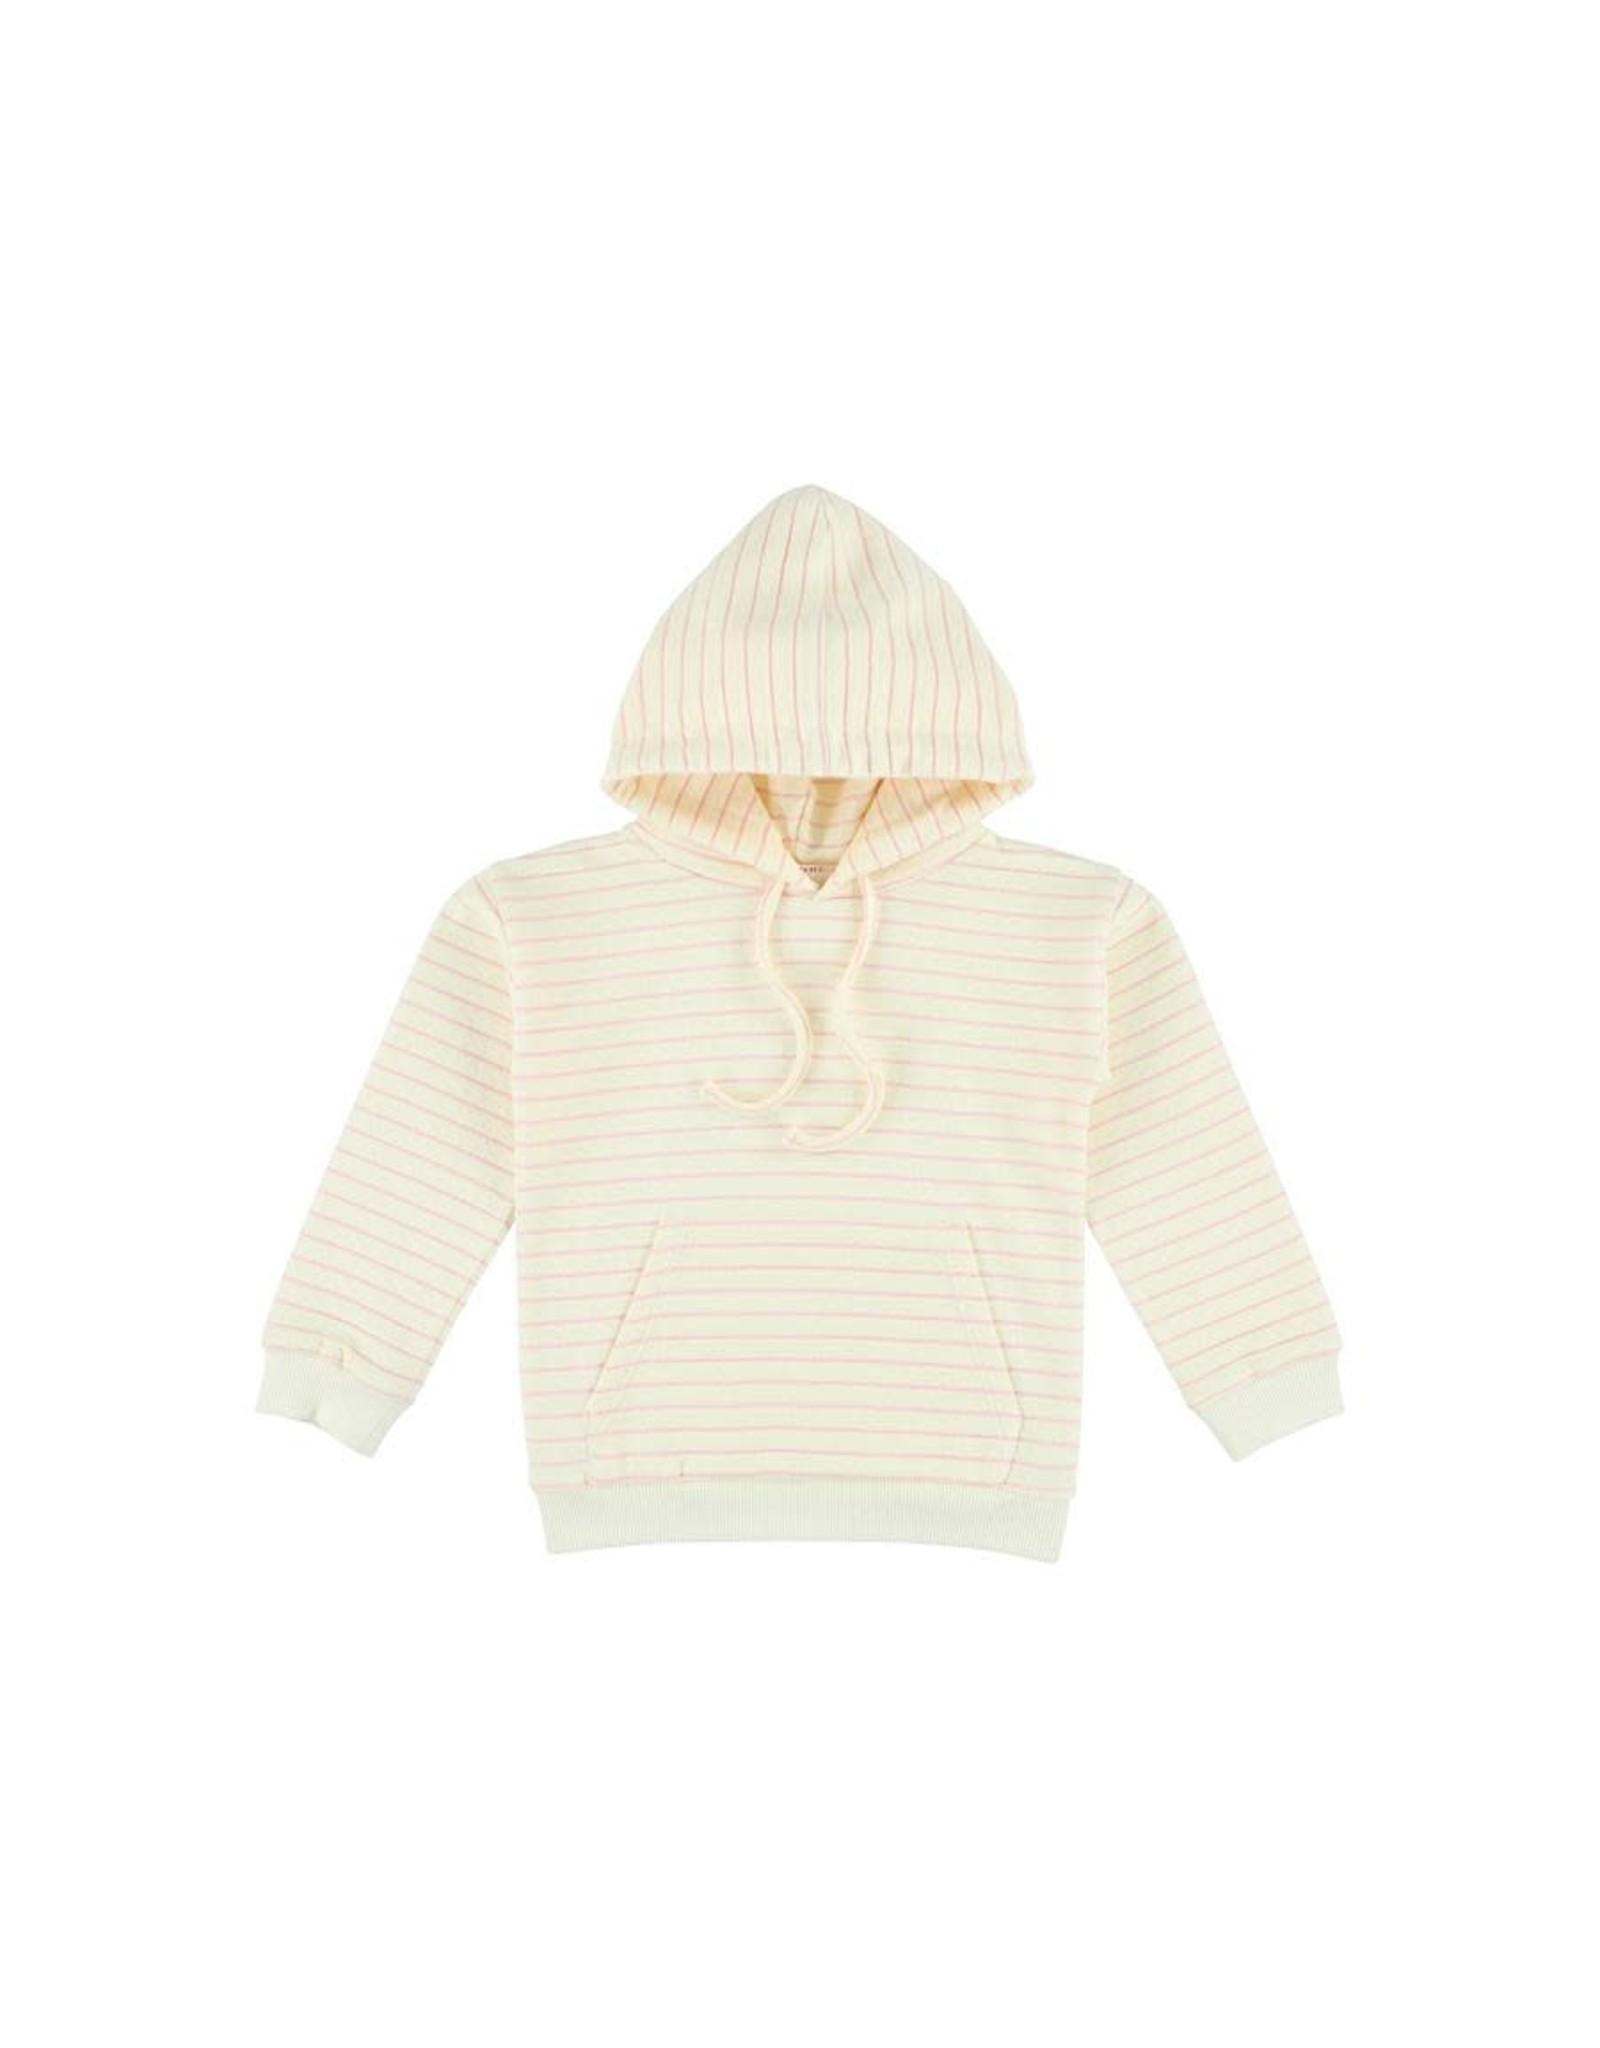 Morley Morley SS21 Jaws Scott Rose sweater